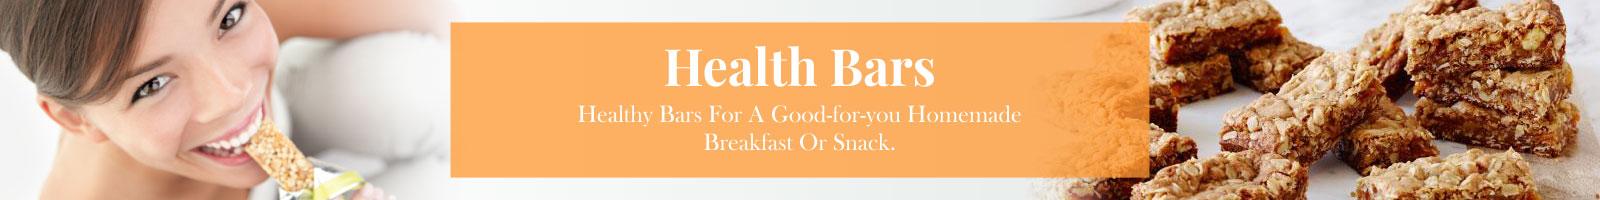 Health Bars